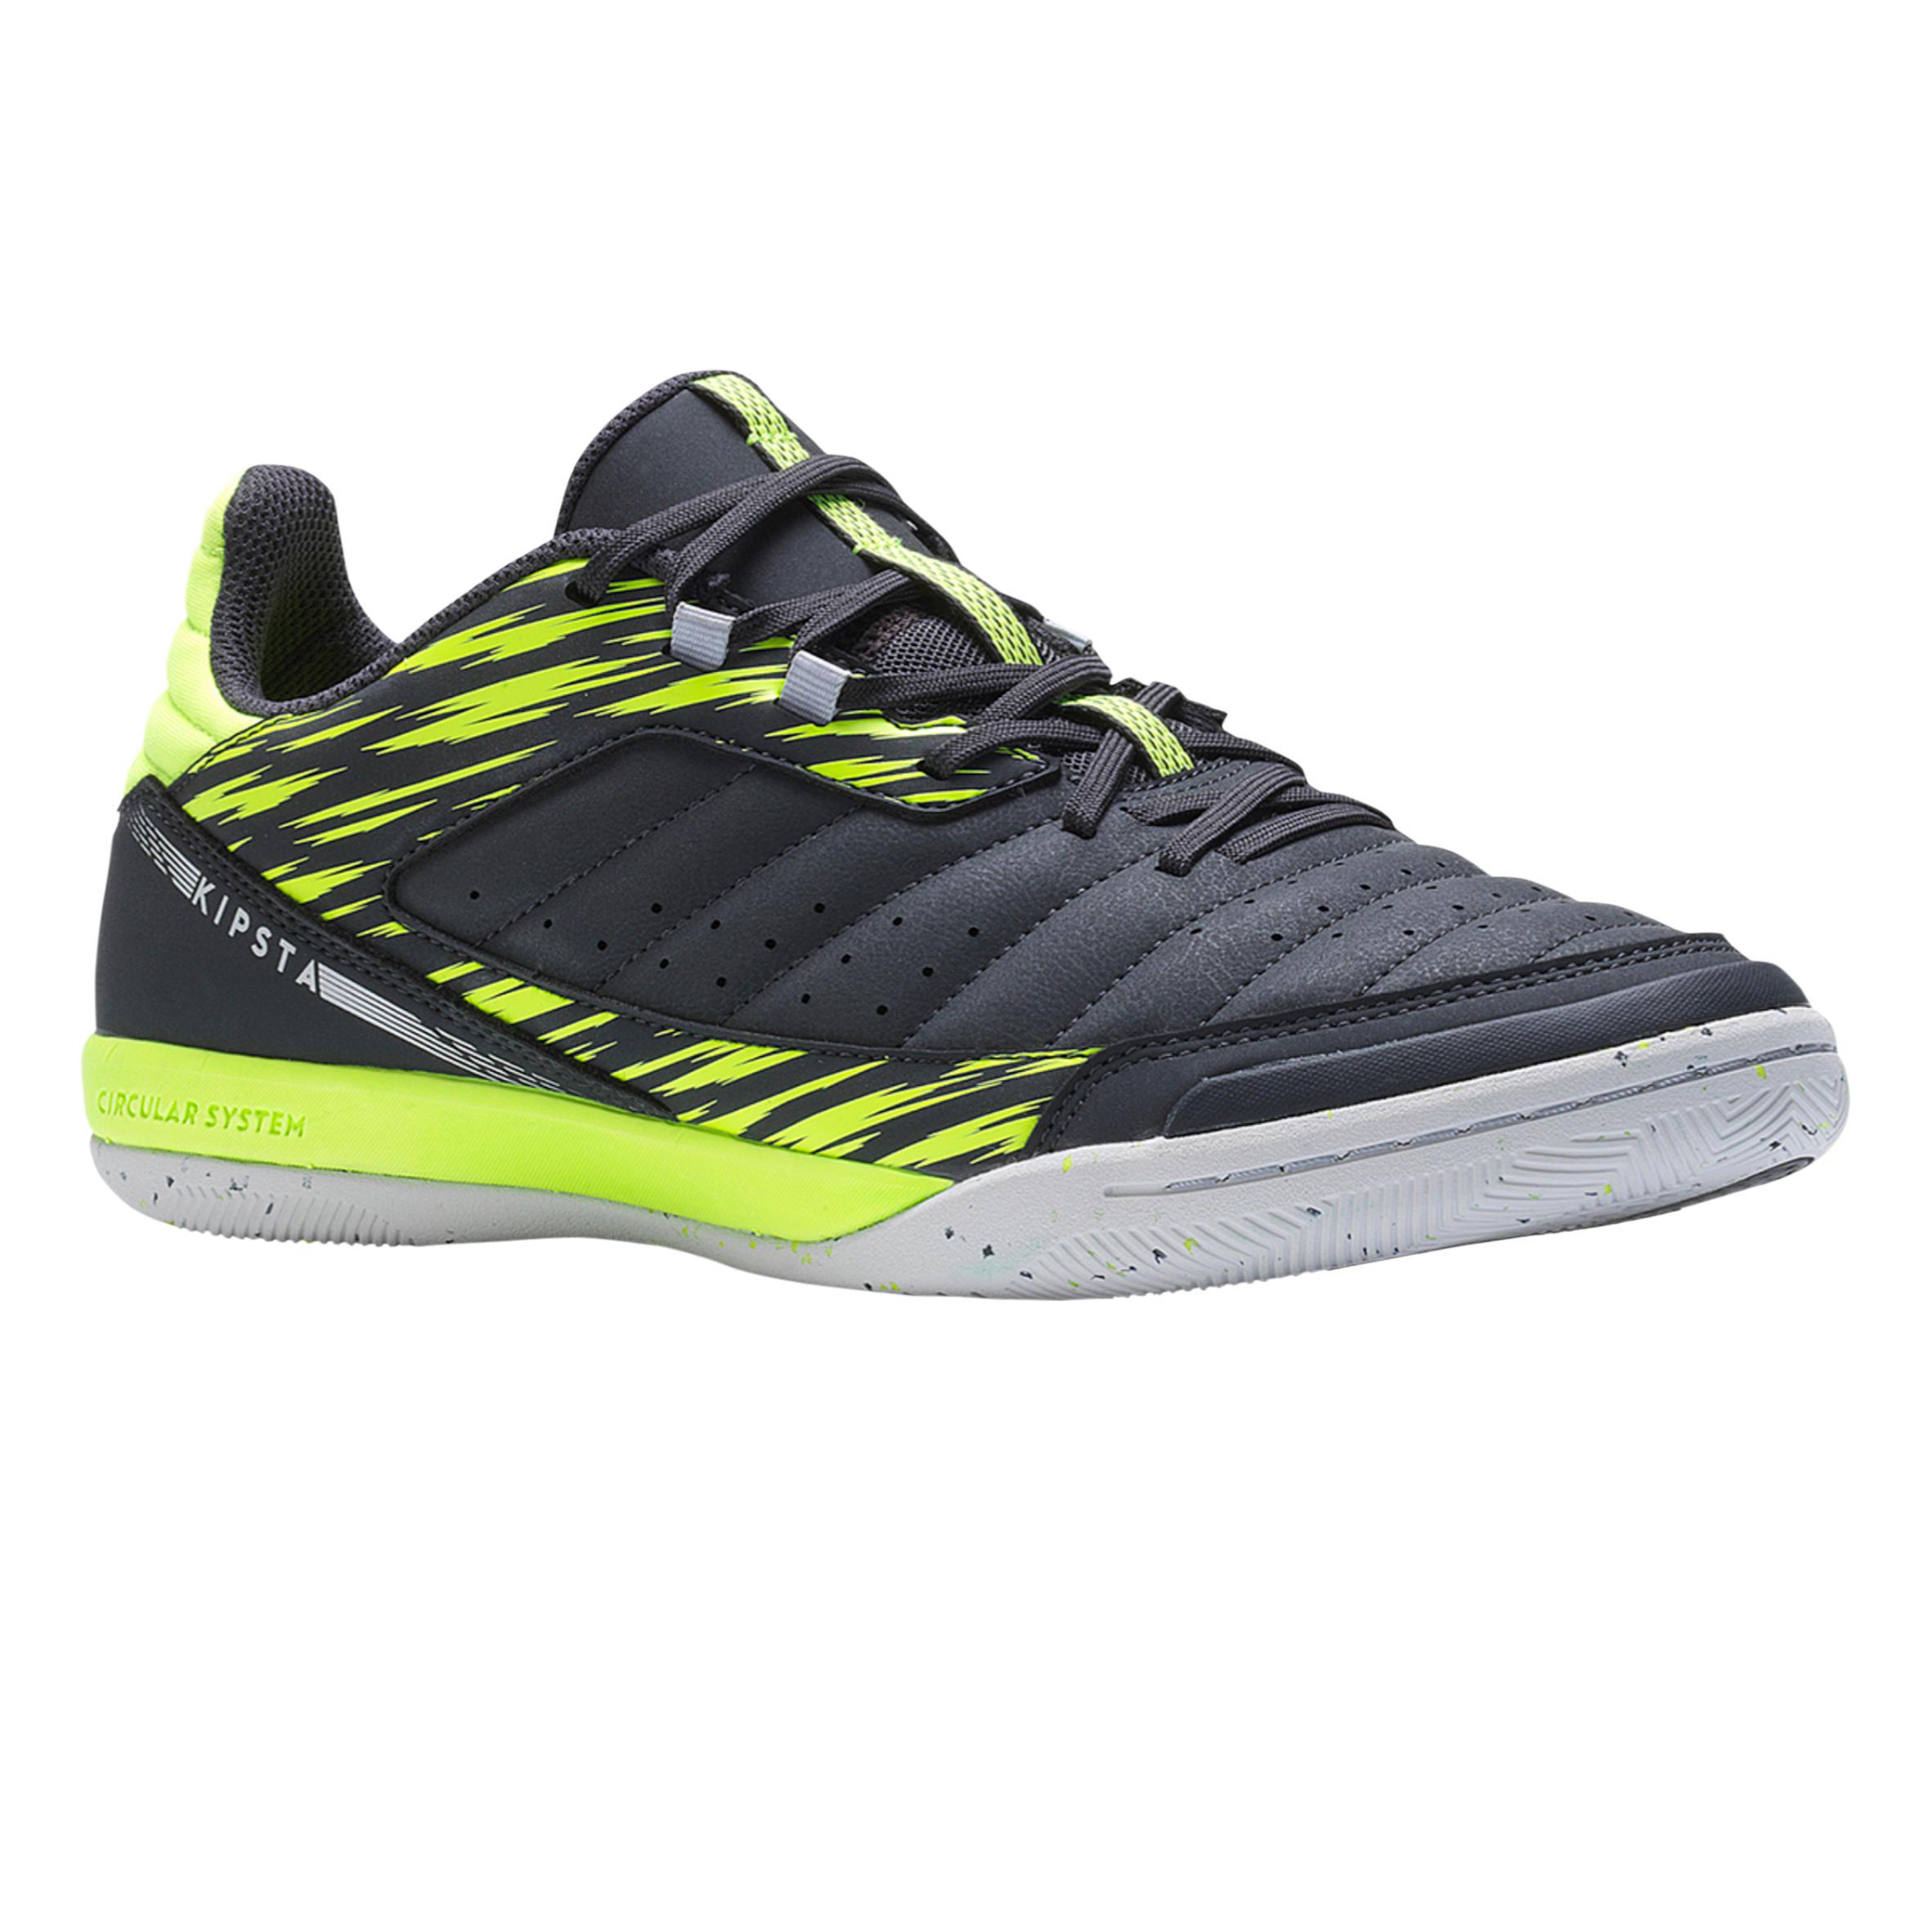 Hallenschuhe Futsal Fußball Eskudo 500 Erwachsene | Schuhe > Sportschuhe > Hallenschuhe | Imviso